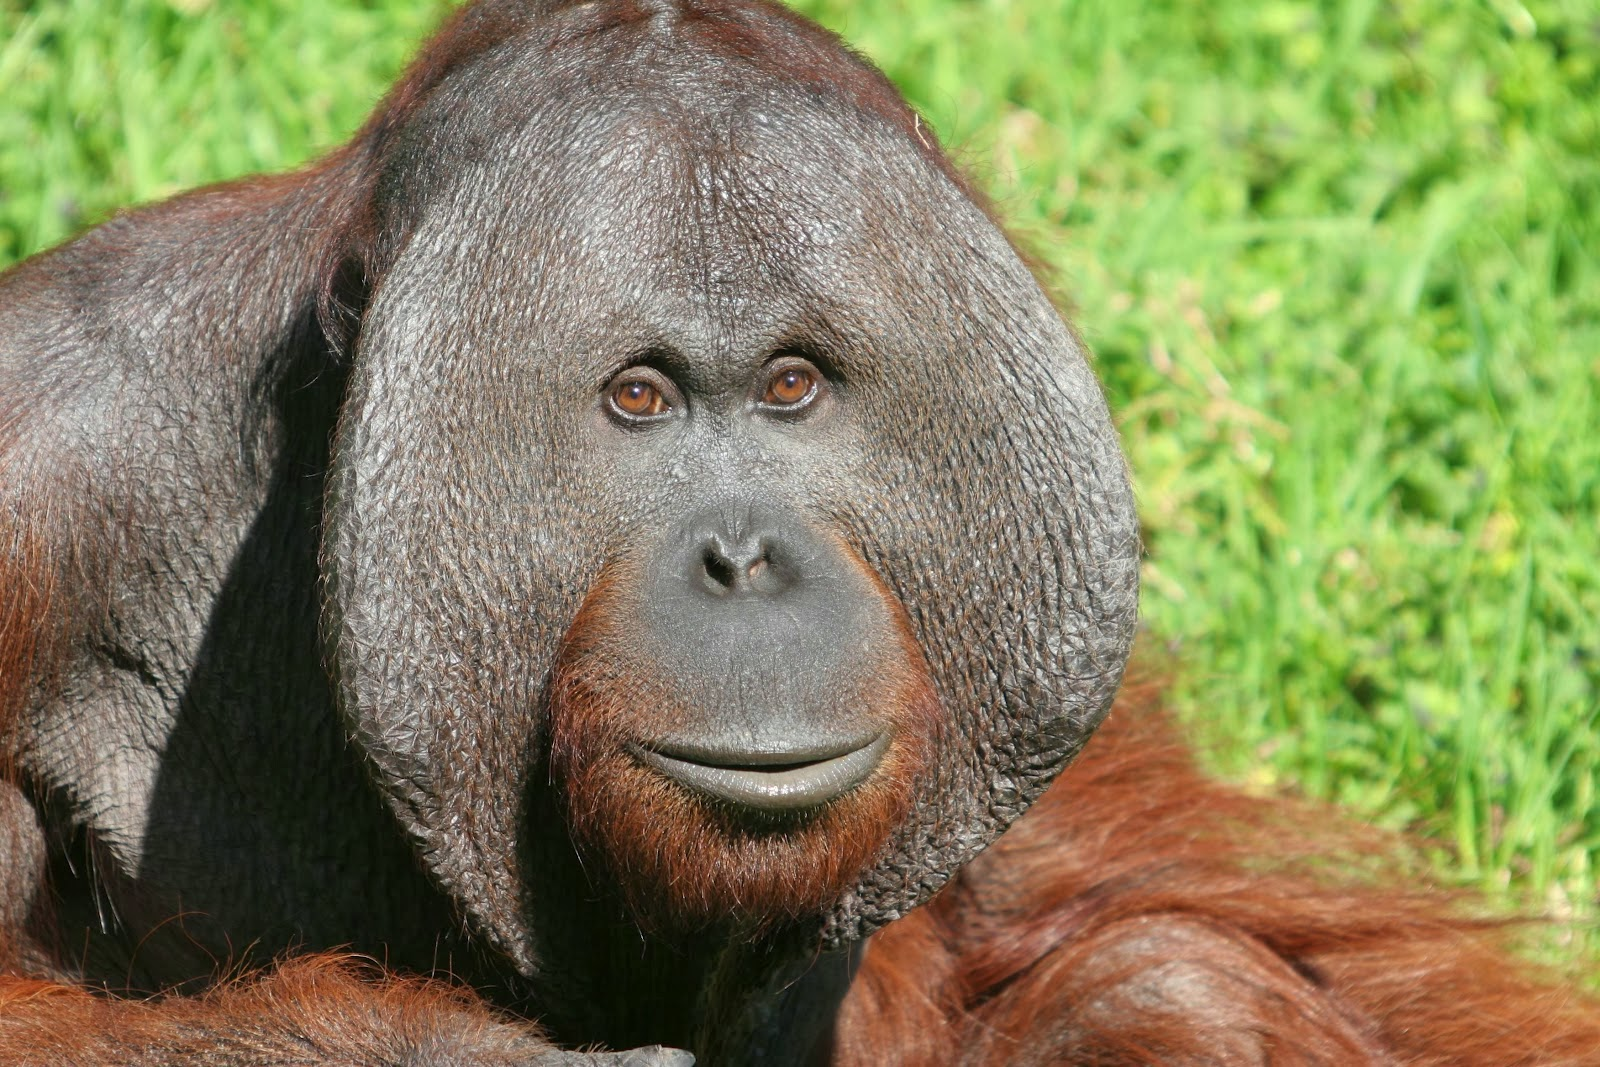 gorilla life cycle diagram saab 9 3 engine of an orangutan a koala elsavadorla